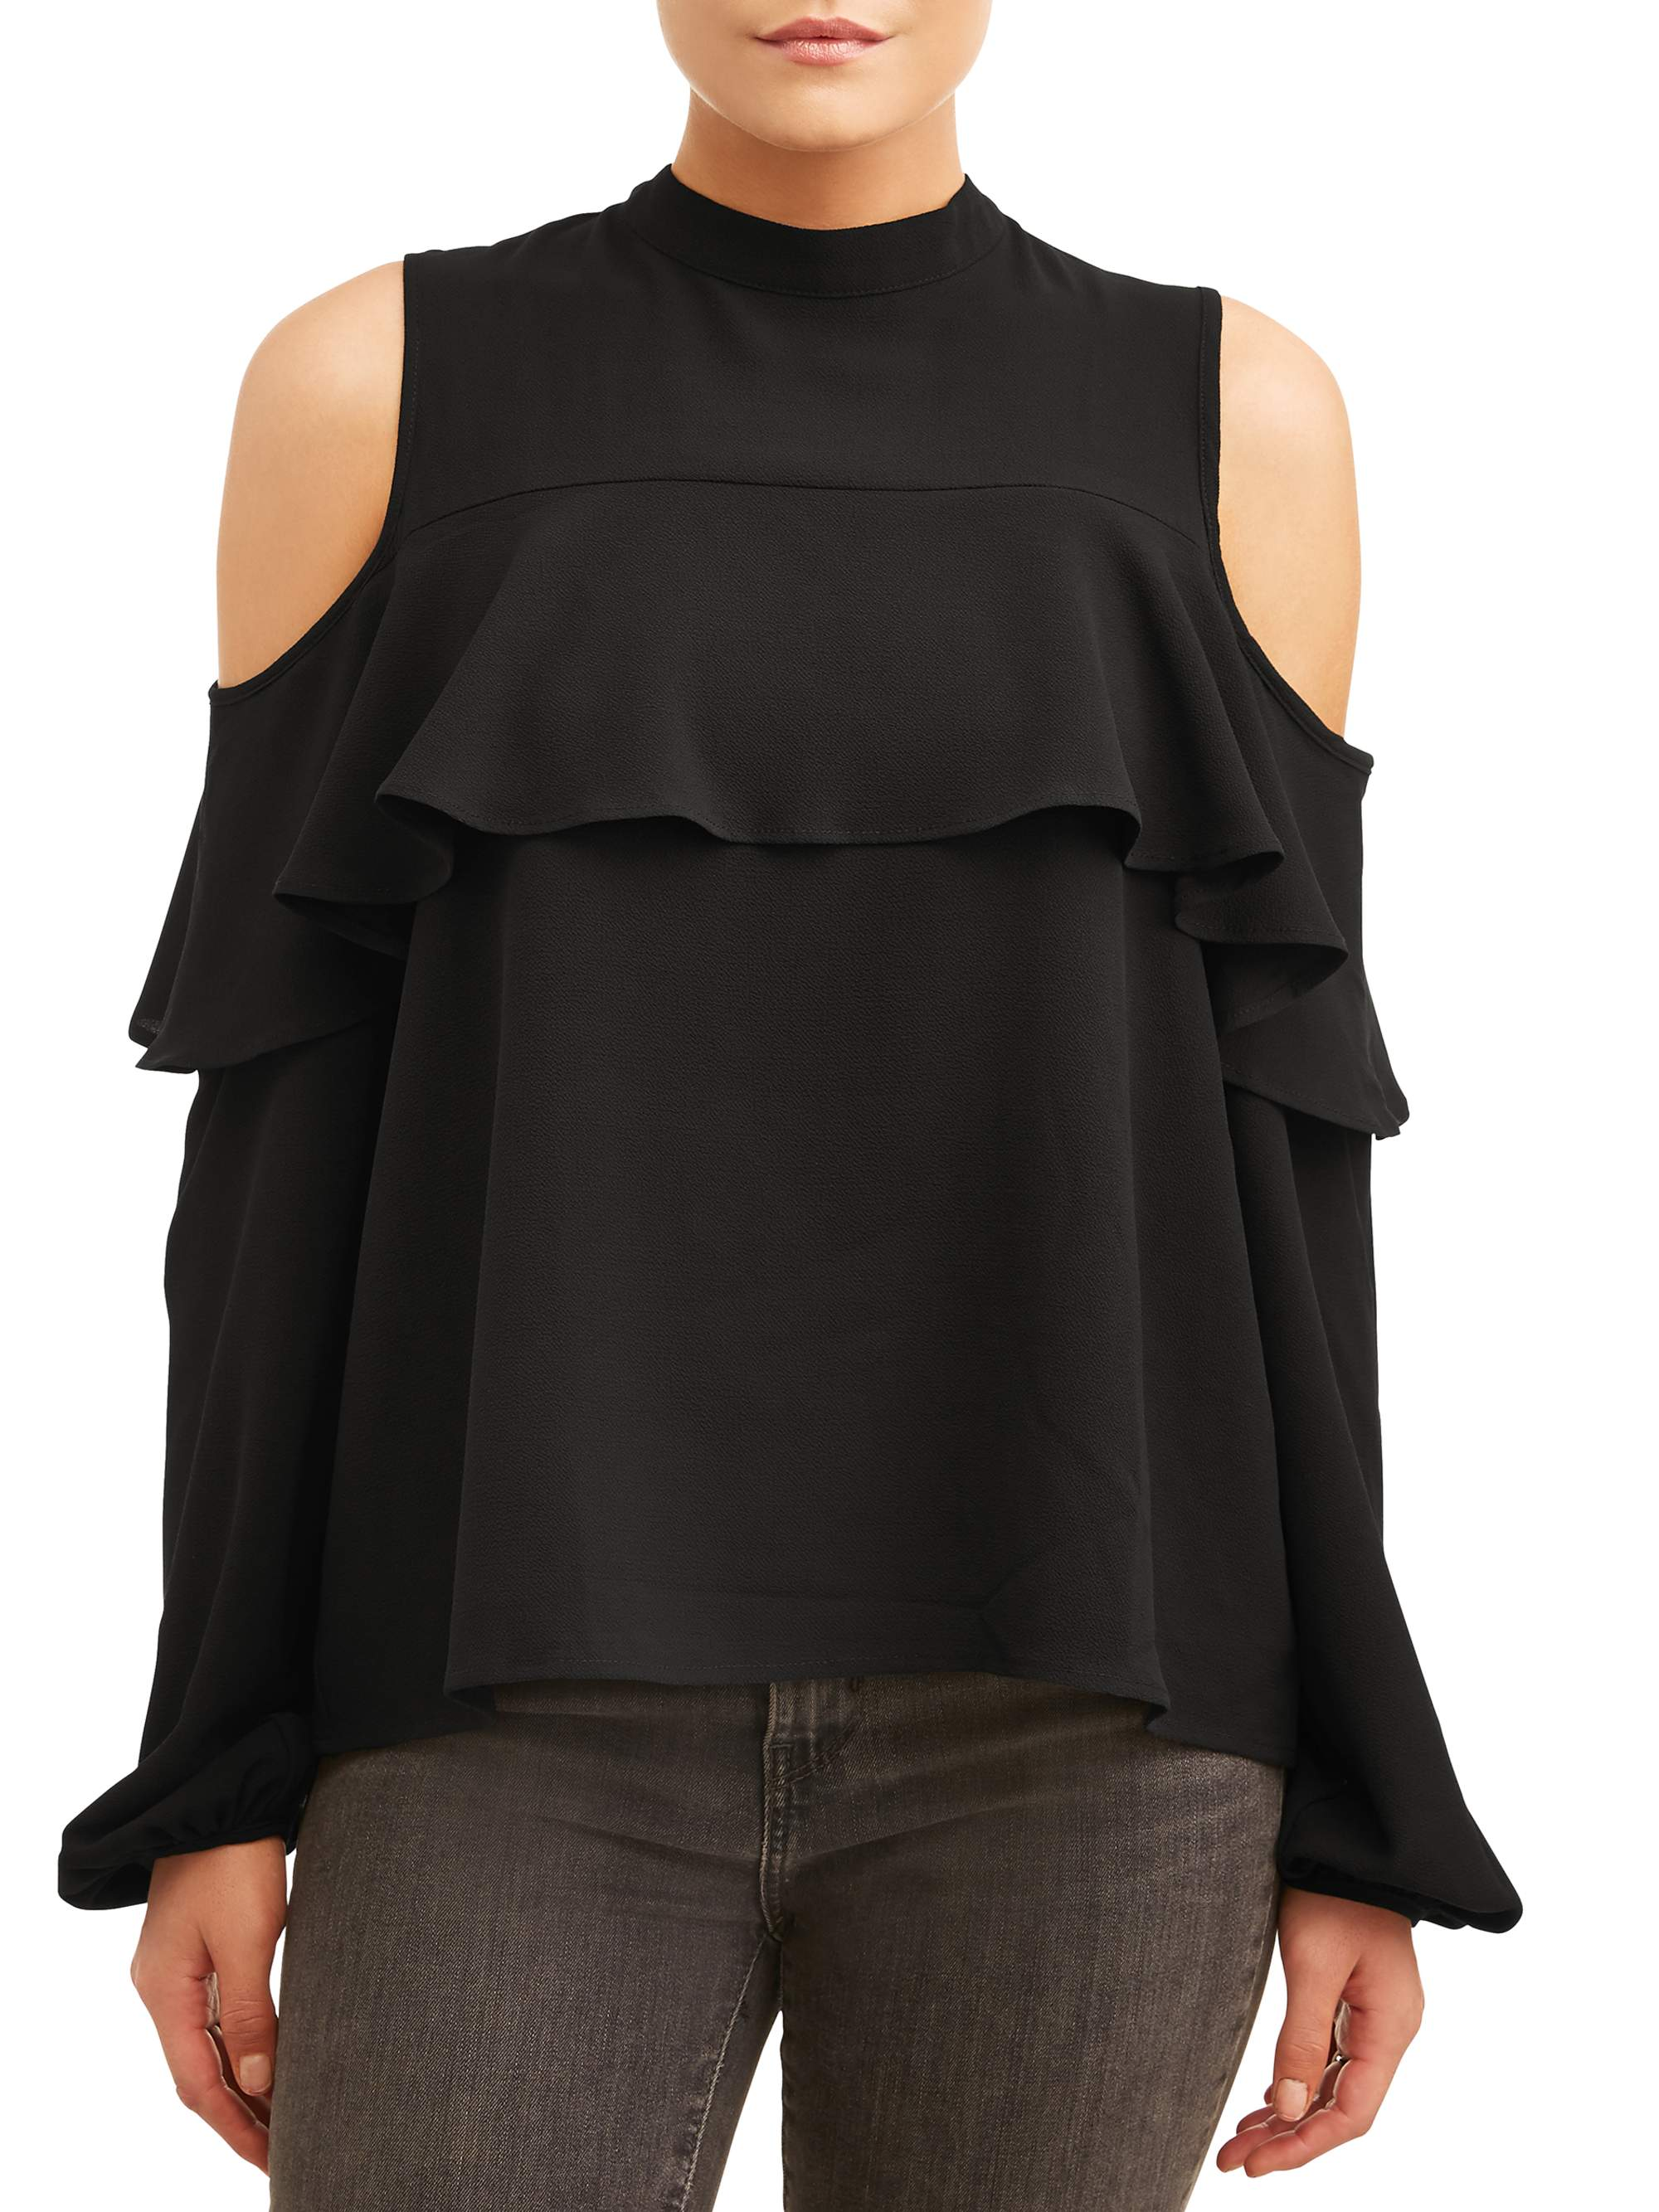 L.N.V. Women's Cold Shoulder Ruffle Top